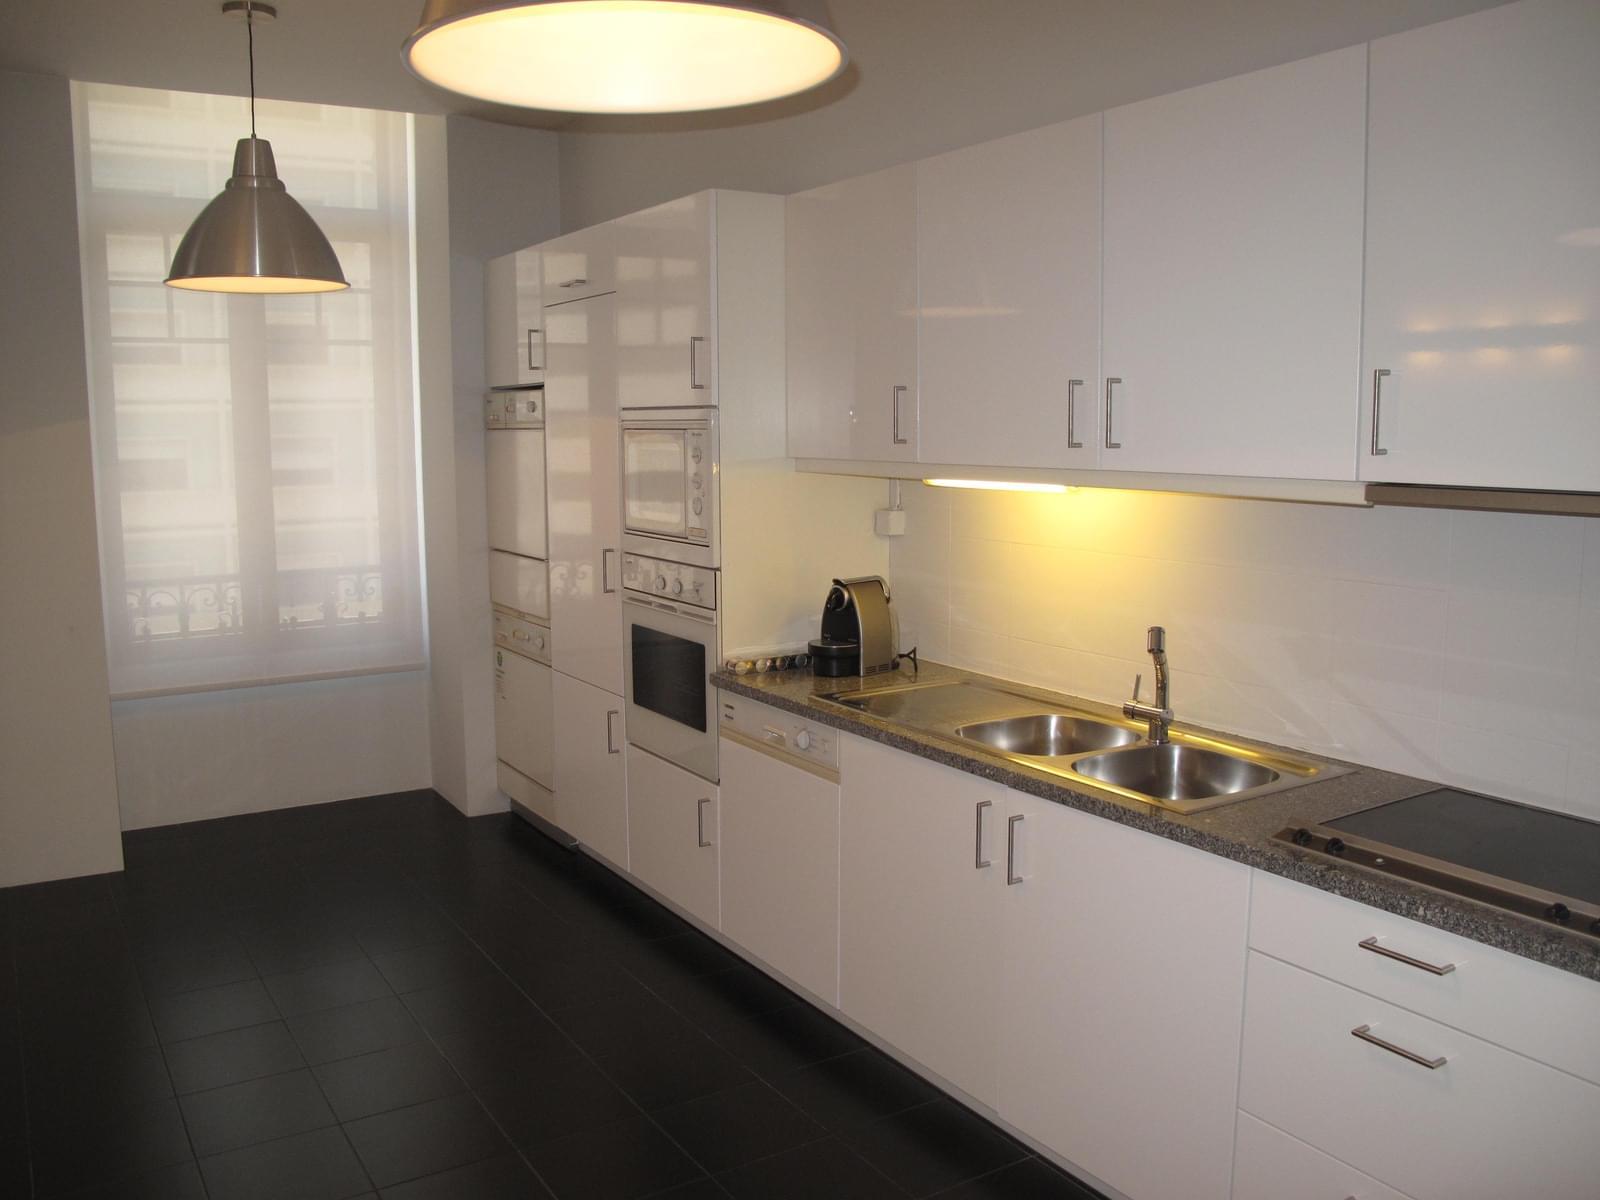 pf18338-apartamento-t2-lisboa-b0719999-389f-4cc7-b640-67c24062ba0f